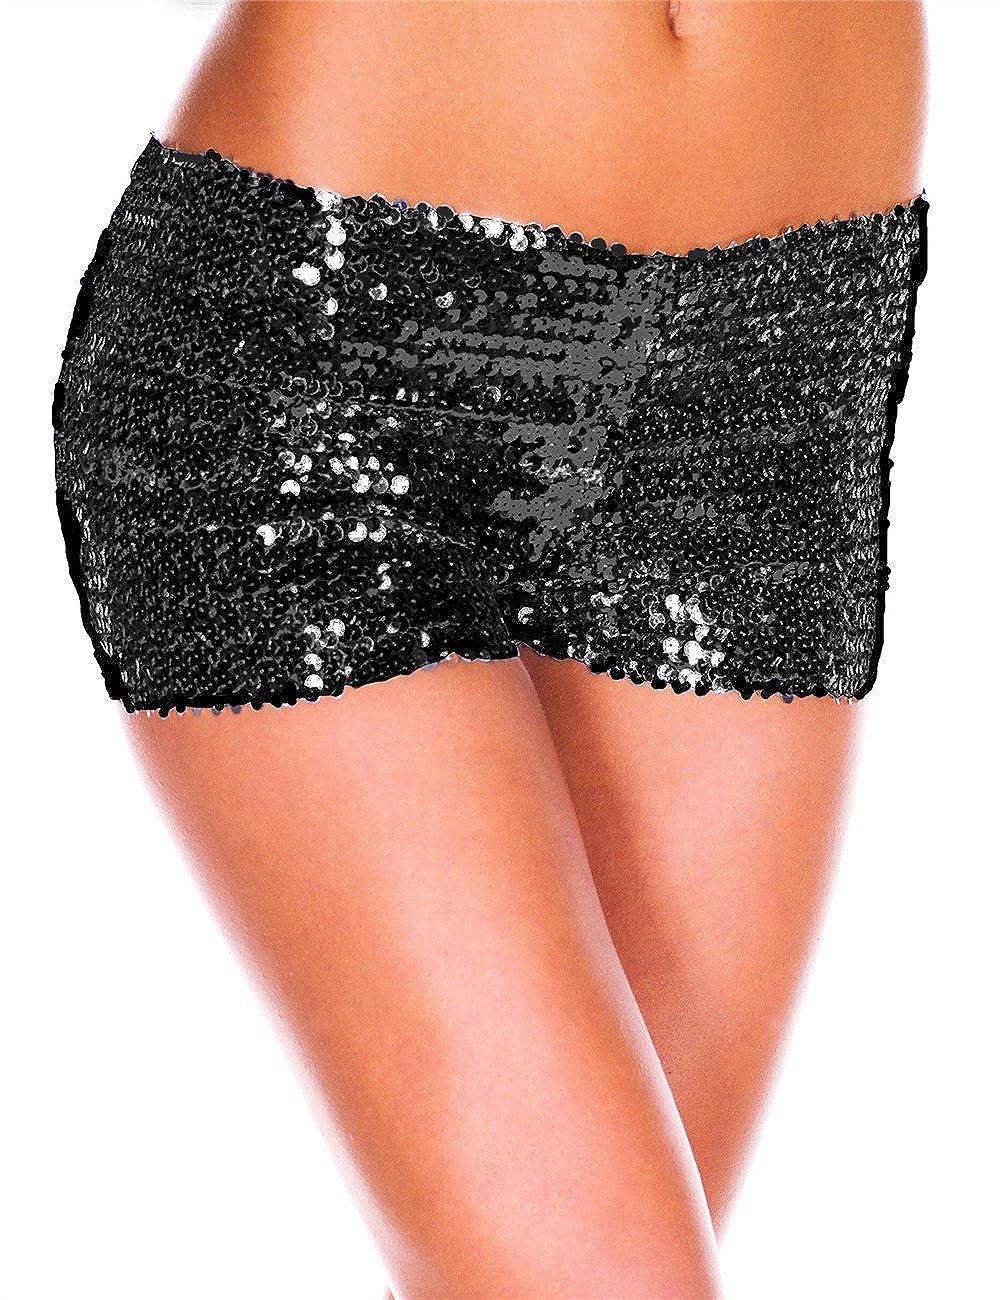 CLOUDY.LEE Women's Elastic Jazz Sequin Pants Briefs-underwear Black 145 One Size